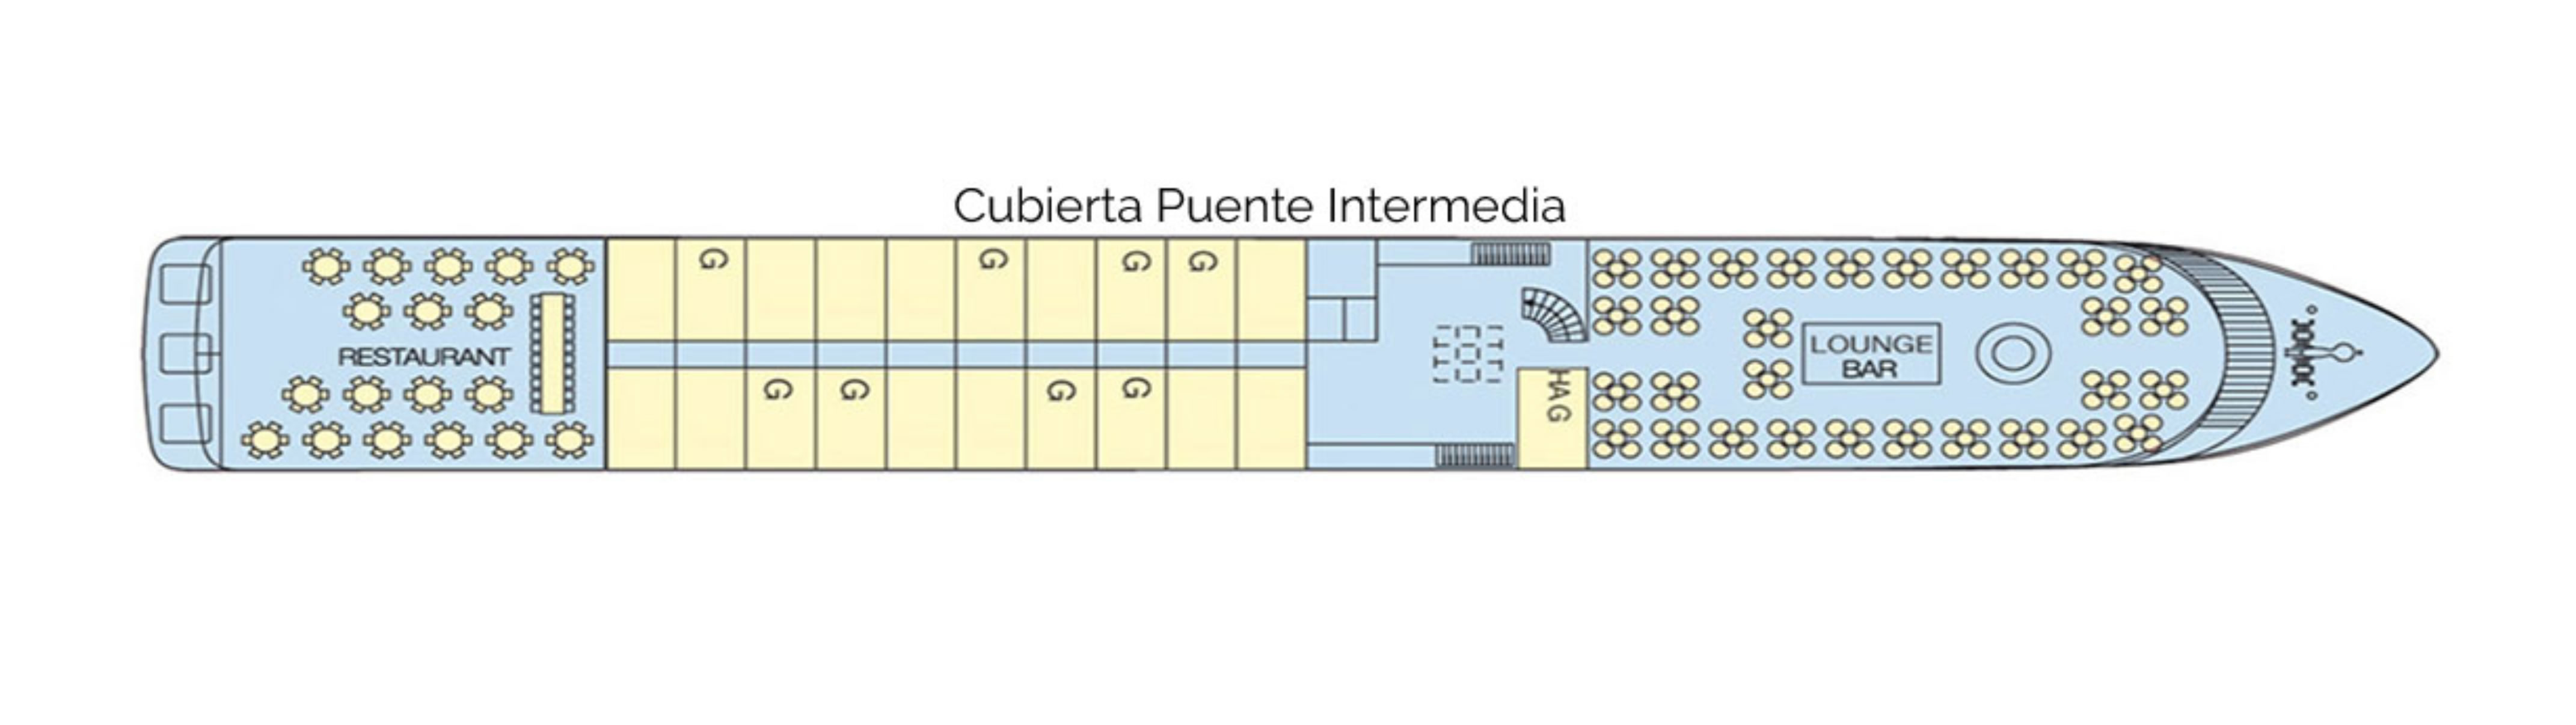 Cubierta Puente Intermedia